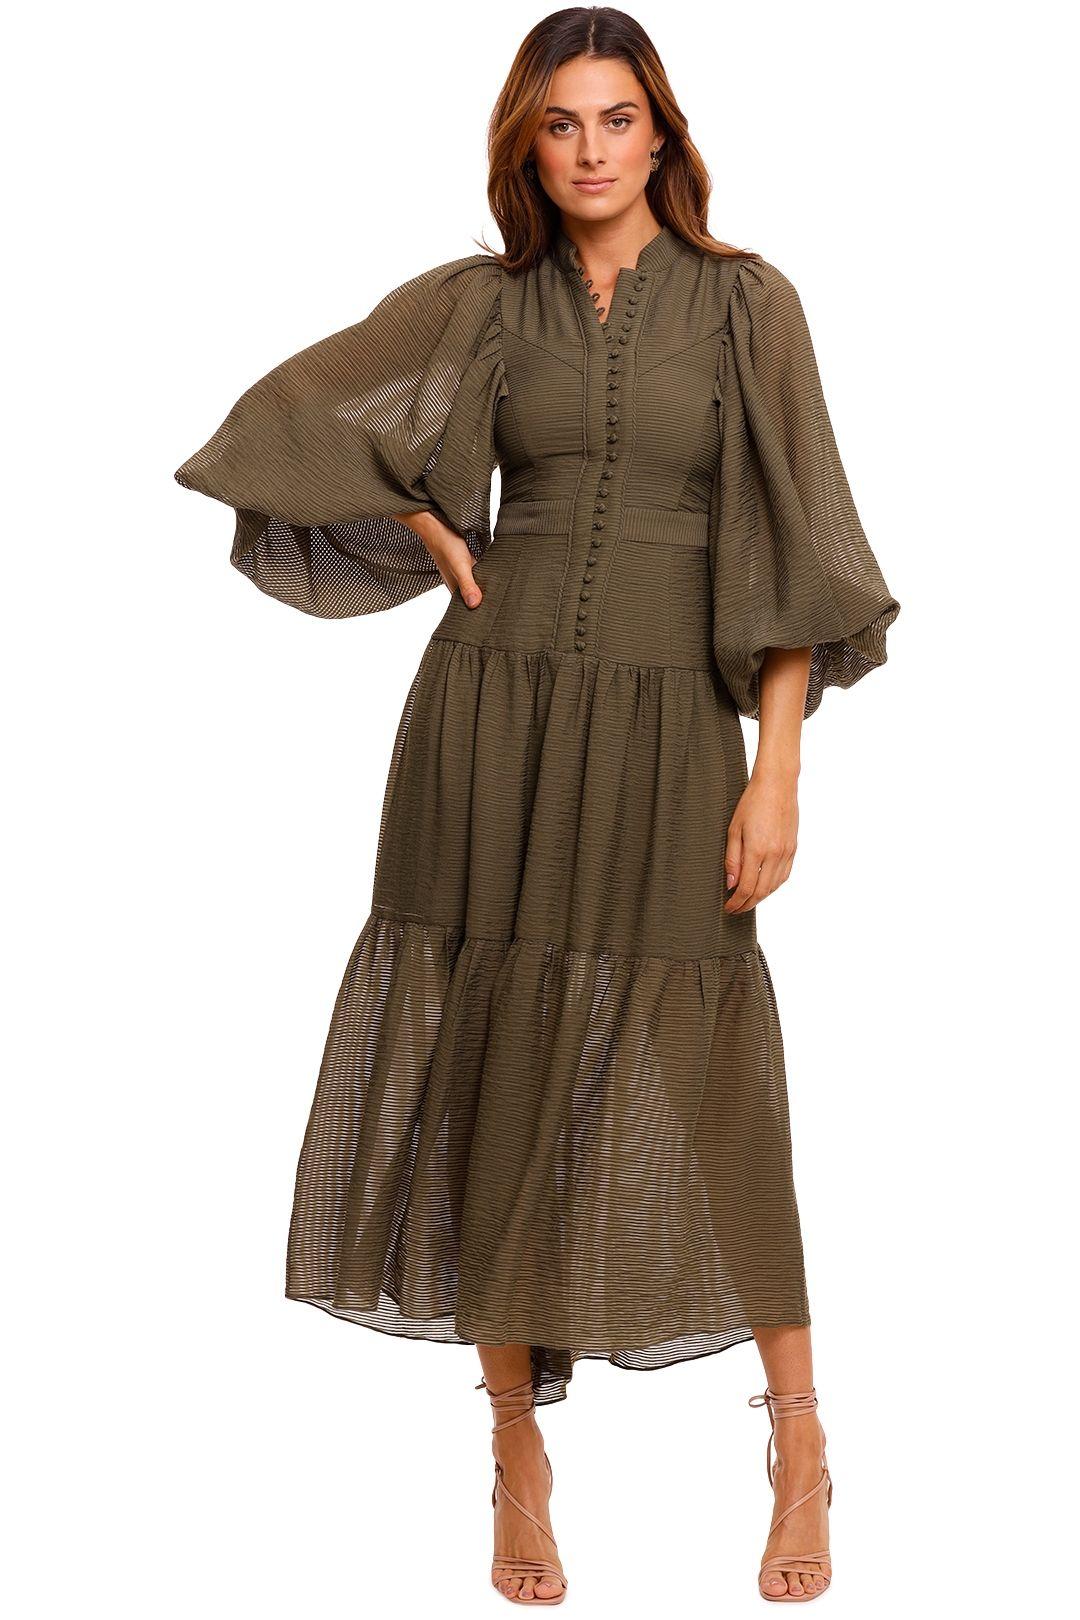 Shona Joy Charlotte High Neck Midi Dress